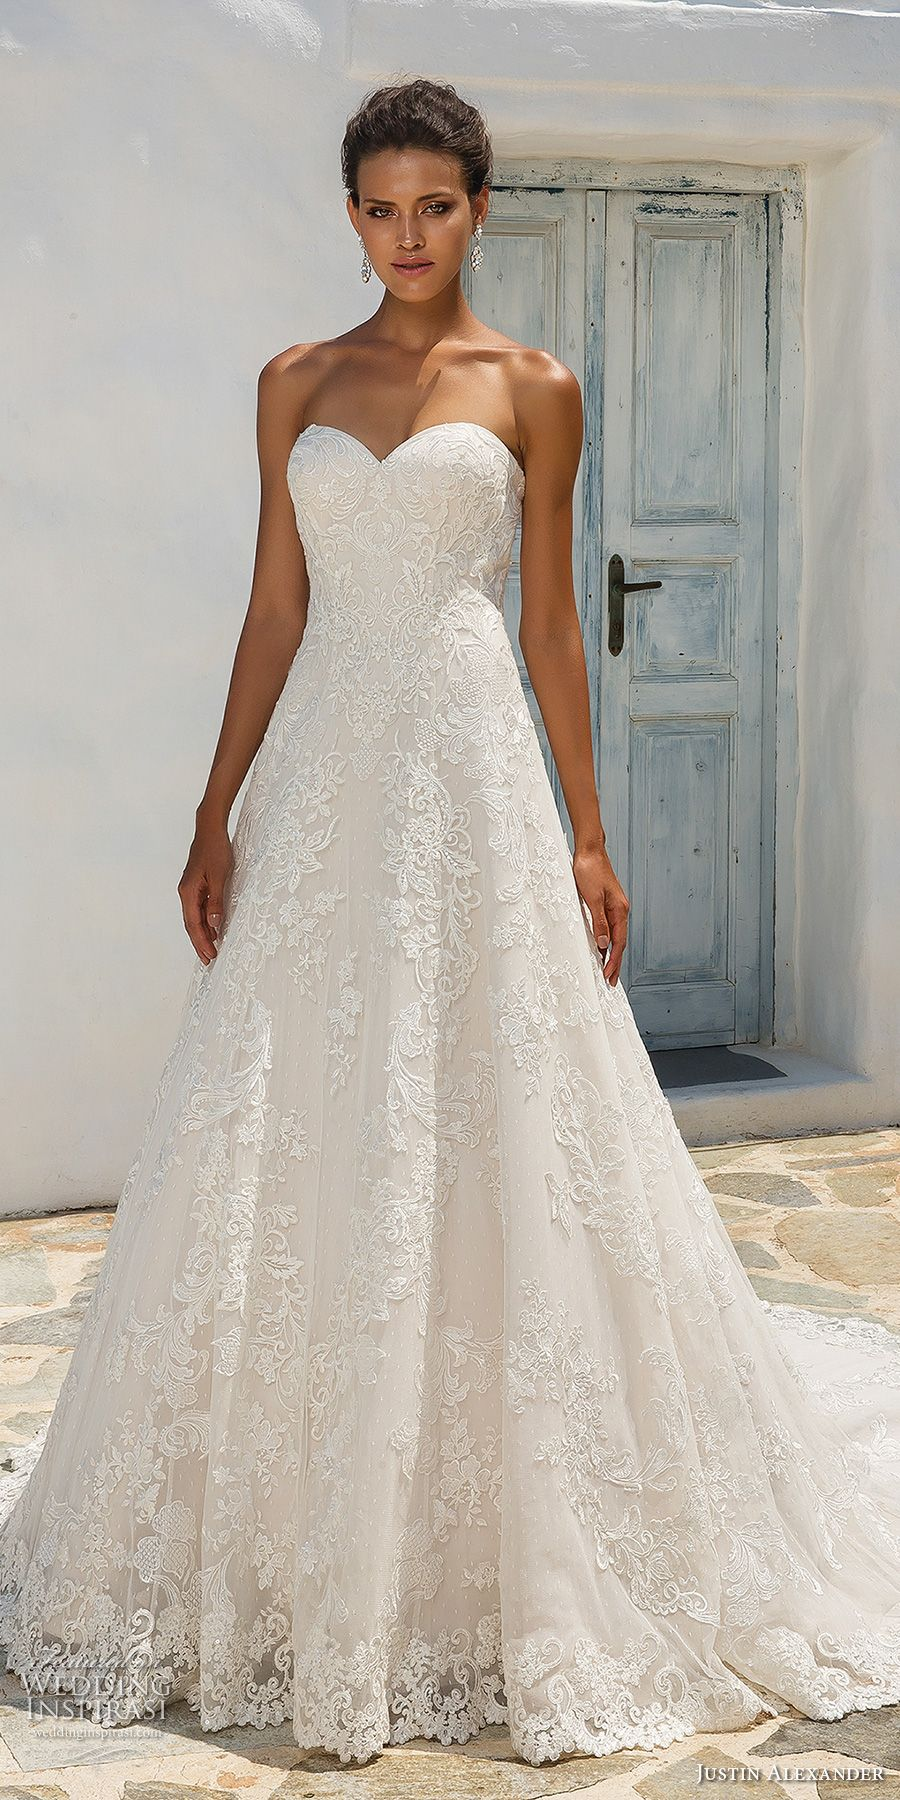 Justin Alexander Spring 2019 Wedding Dresses Wedding Inspirasi Justin Alexander Wedding Dress Bridal Ball Gown Ball Gowns Wedding